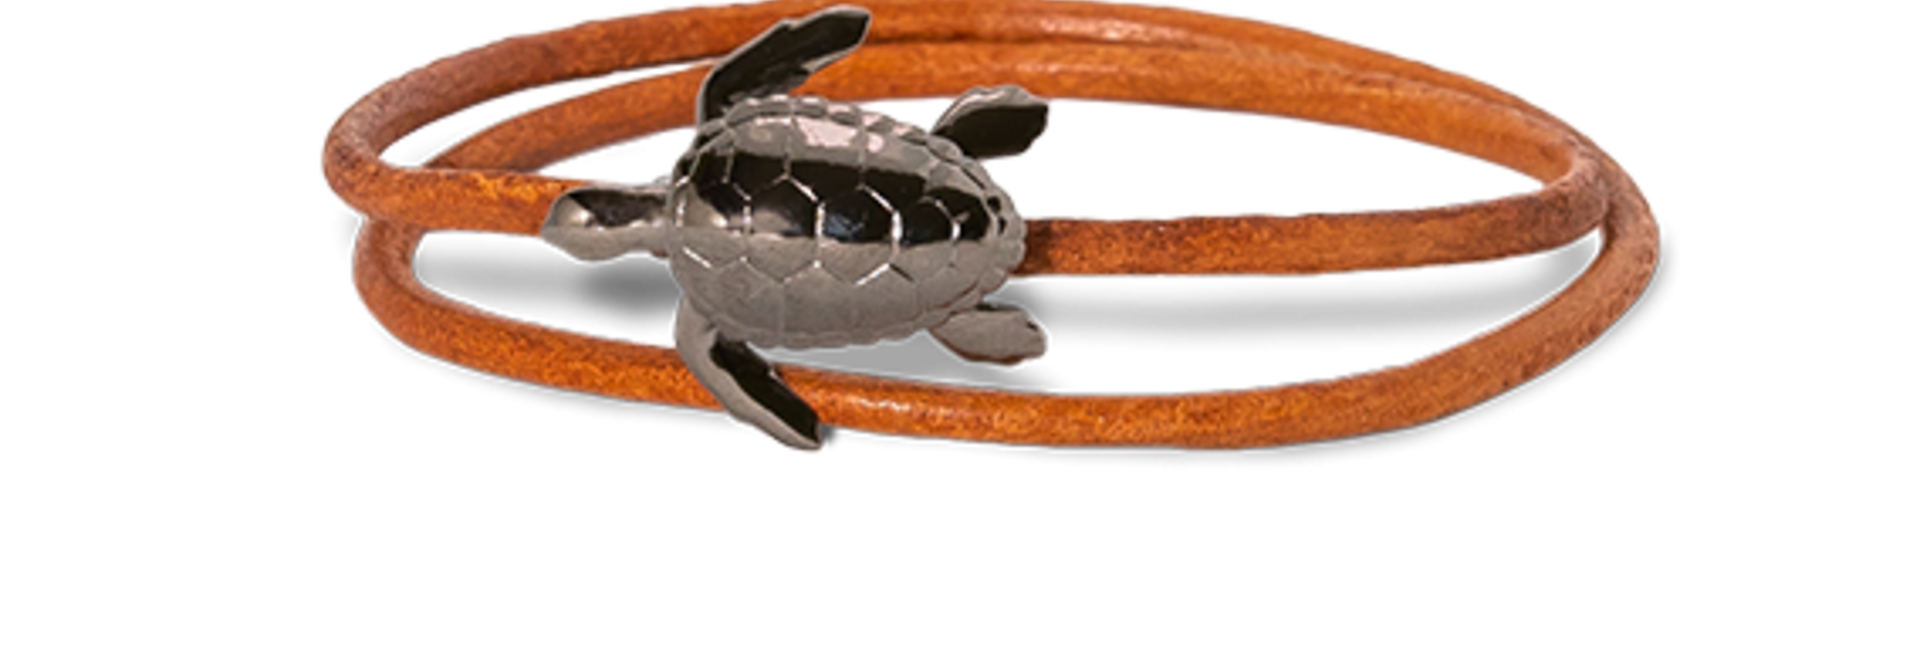 Turtle armband bruine band